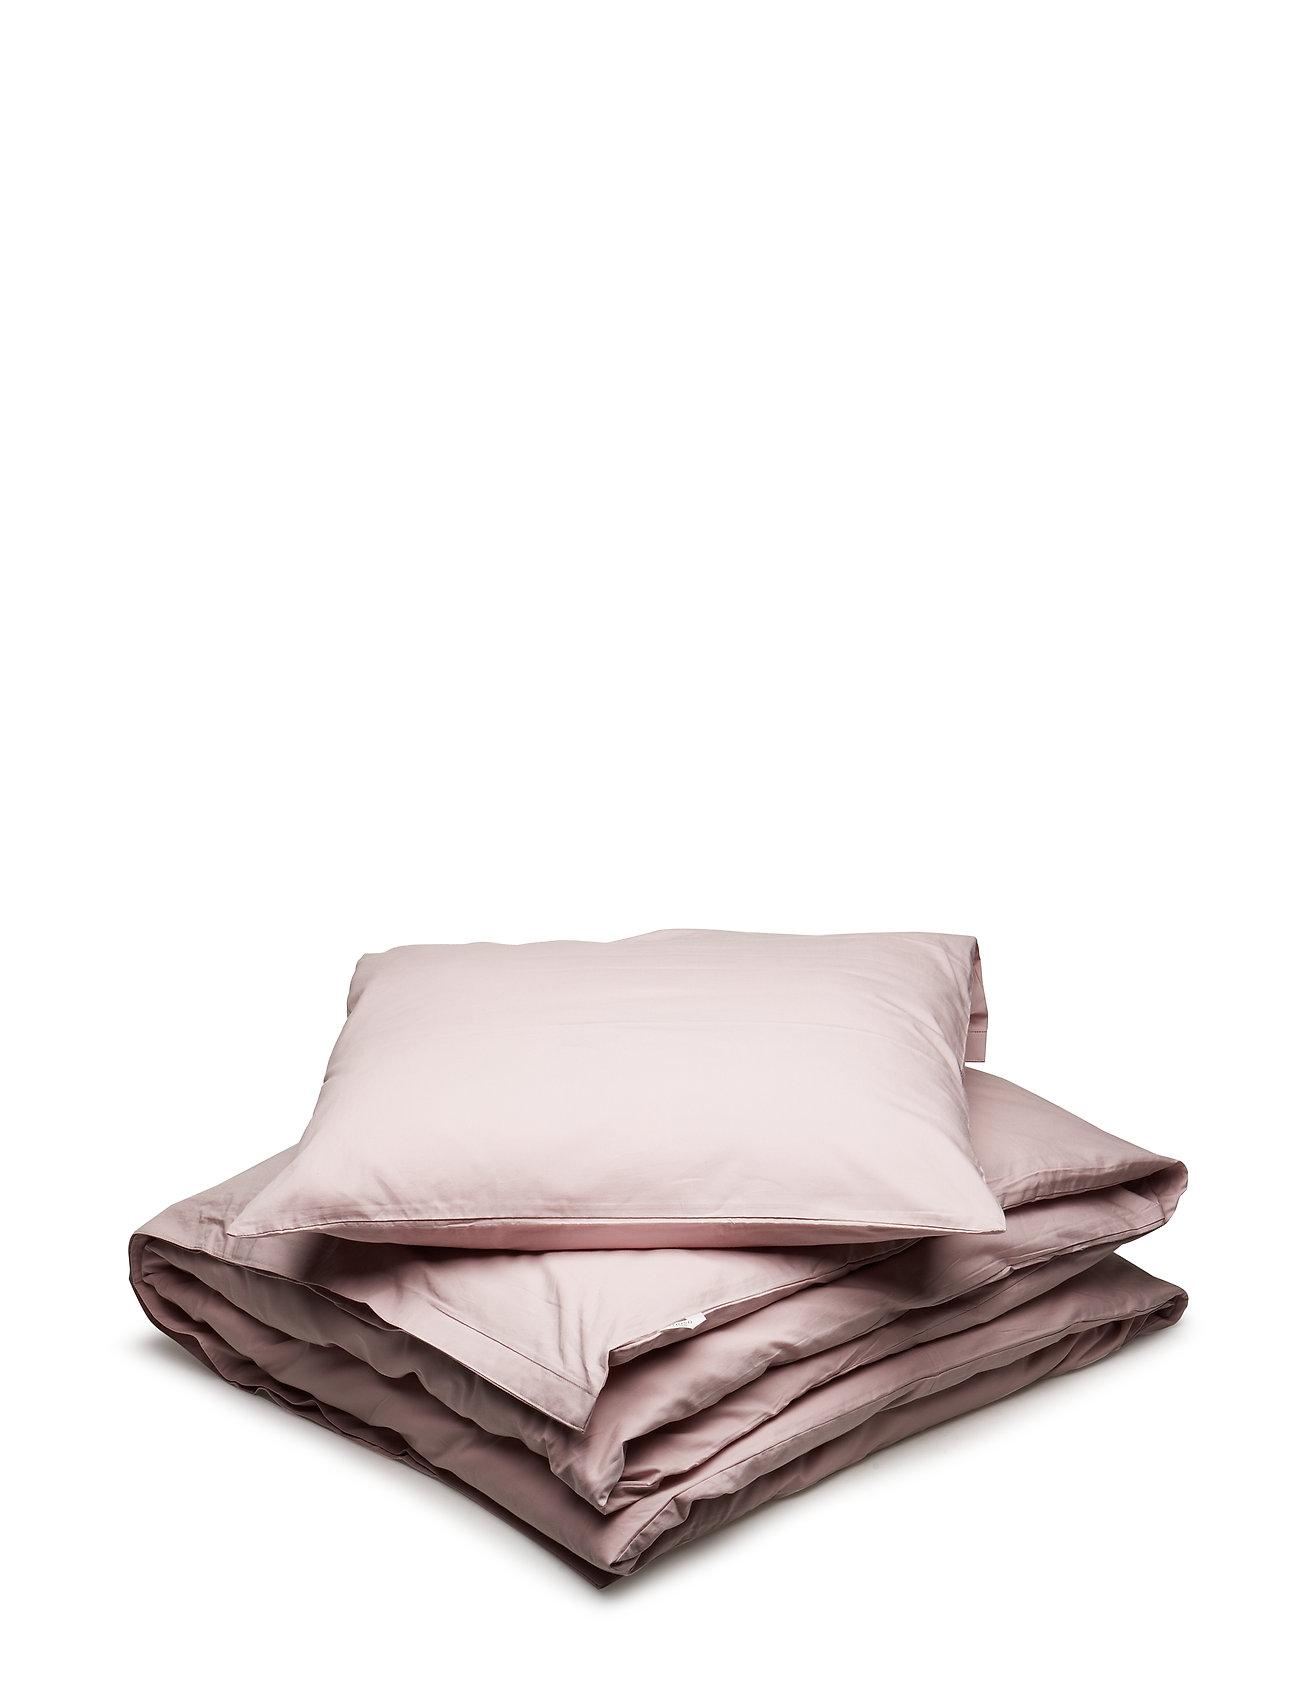 Solid By Cotton LongroseMüsli Bed Linen Adult Green edxCBoWr